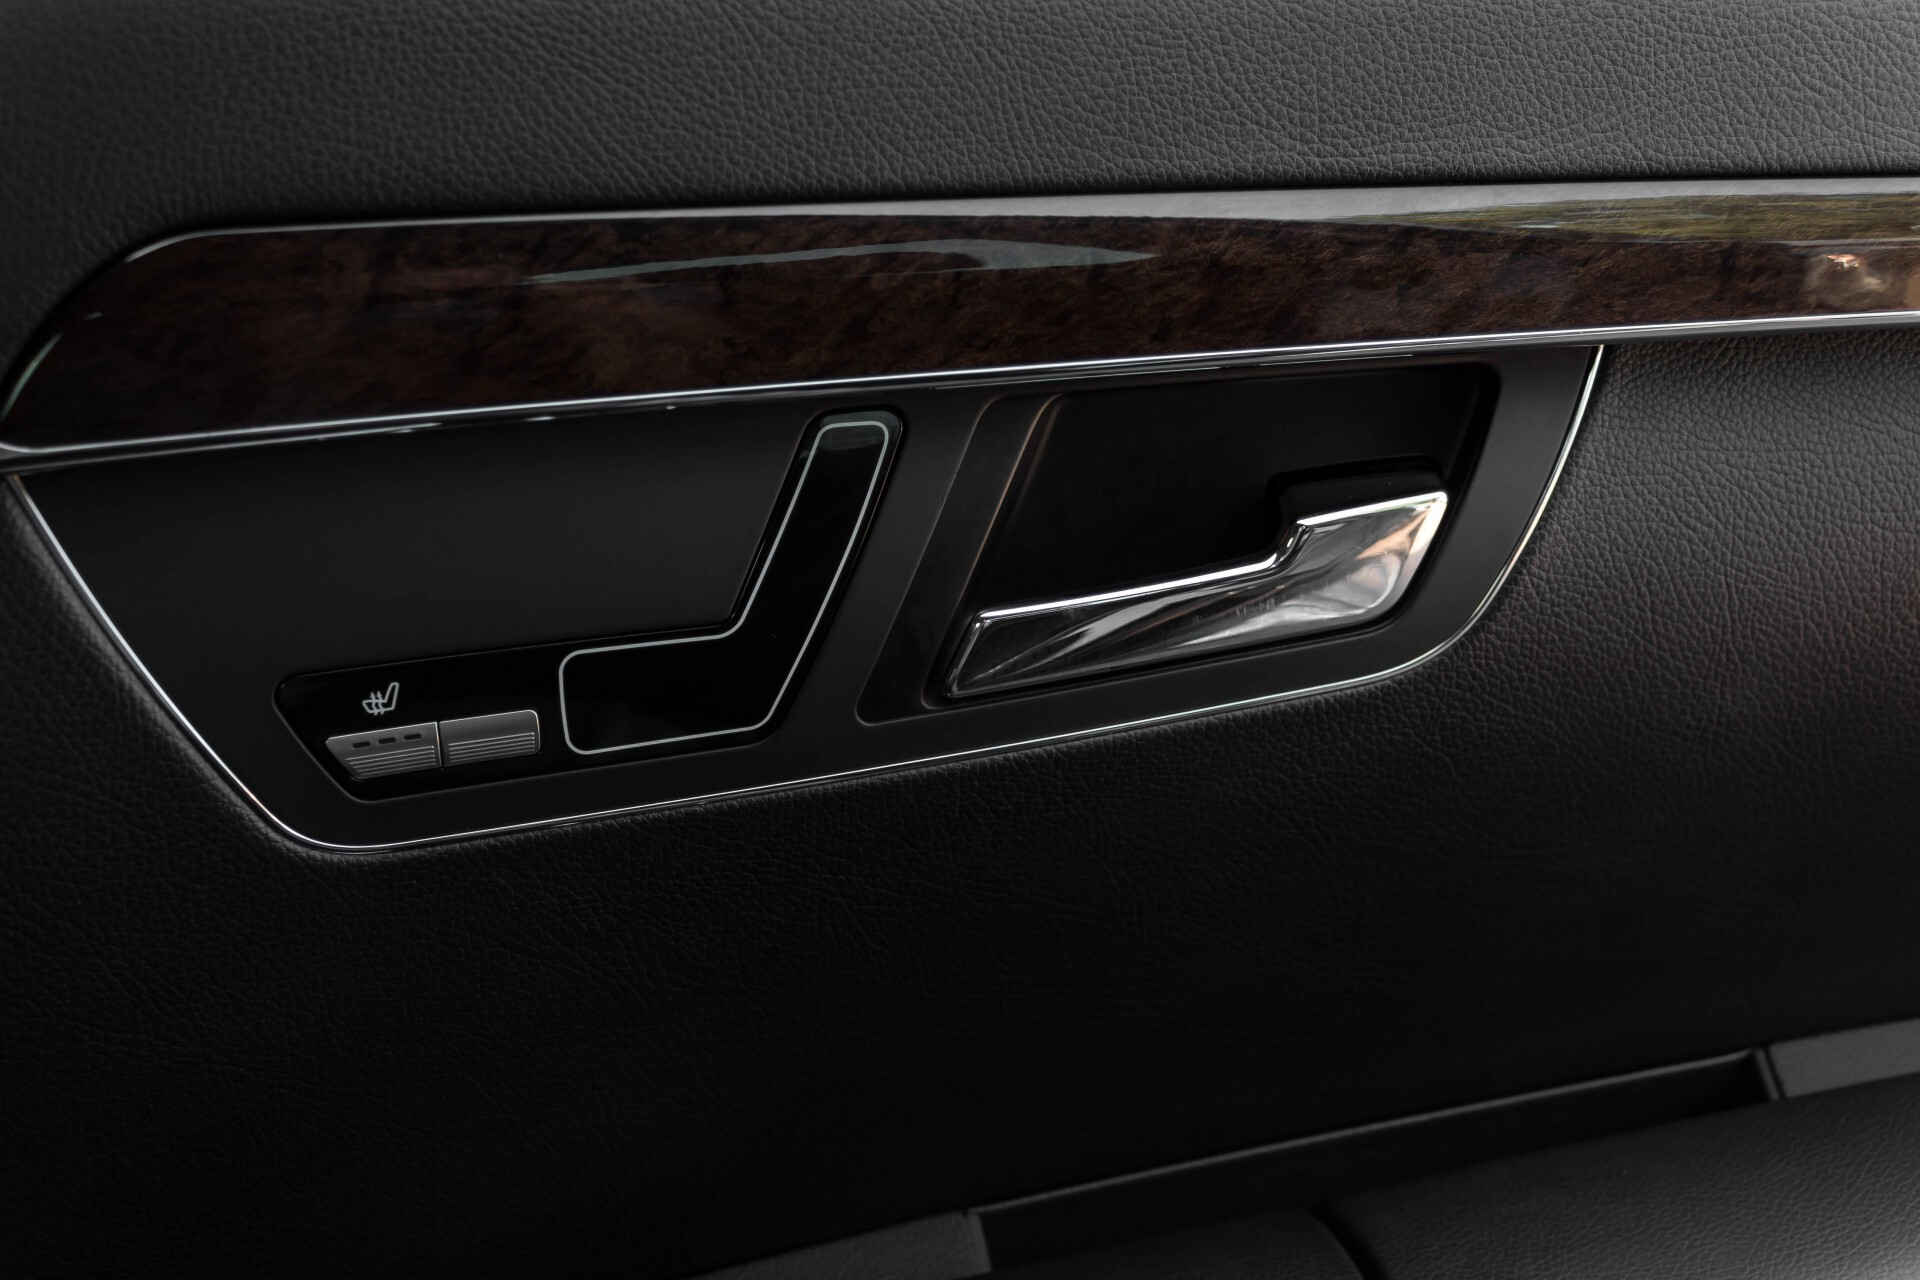 Mercedes-Benz S-Klasse 350 Bluetec Keyless/Distronic/Nightvision/Schuifdak/Harman-Kardon Aut7 Foto 45